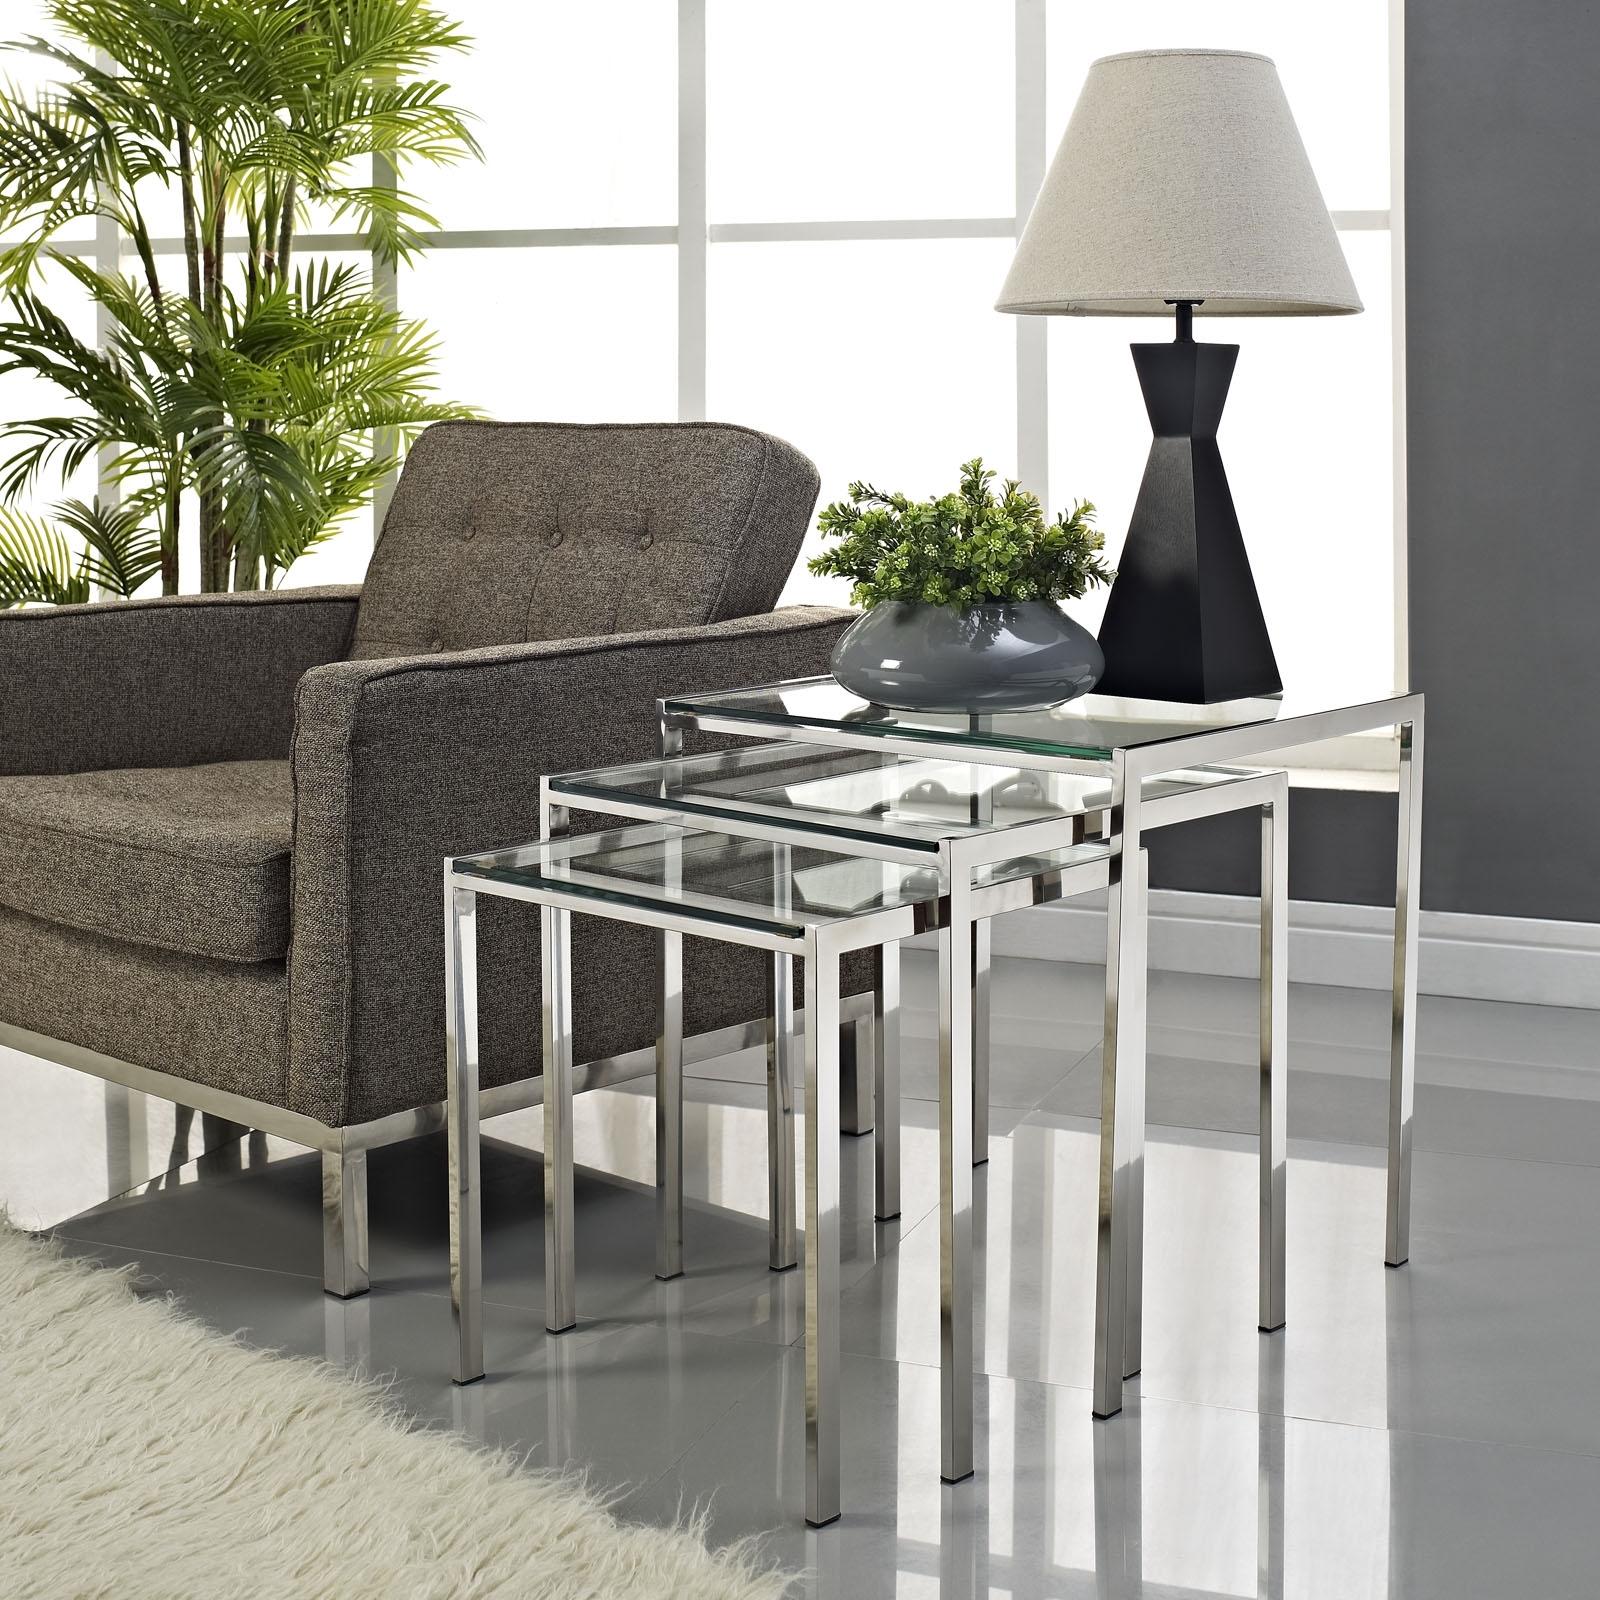 LexMod Nimble Stainless Steel Nesting Table Set